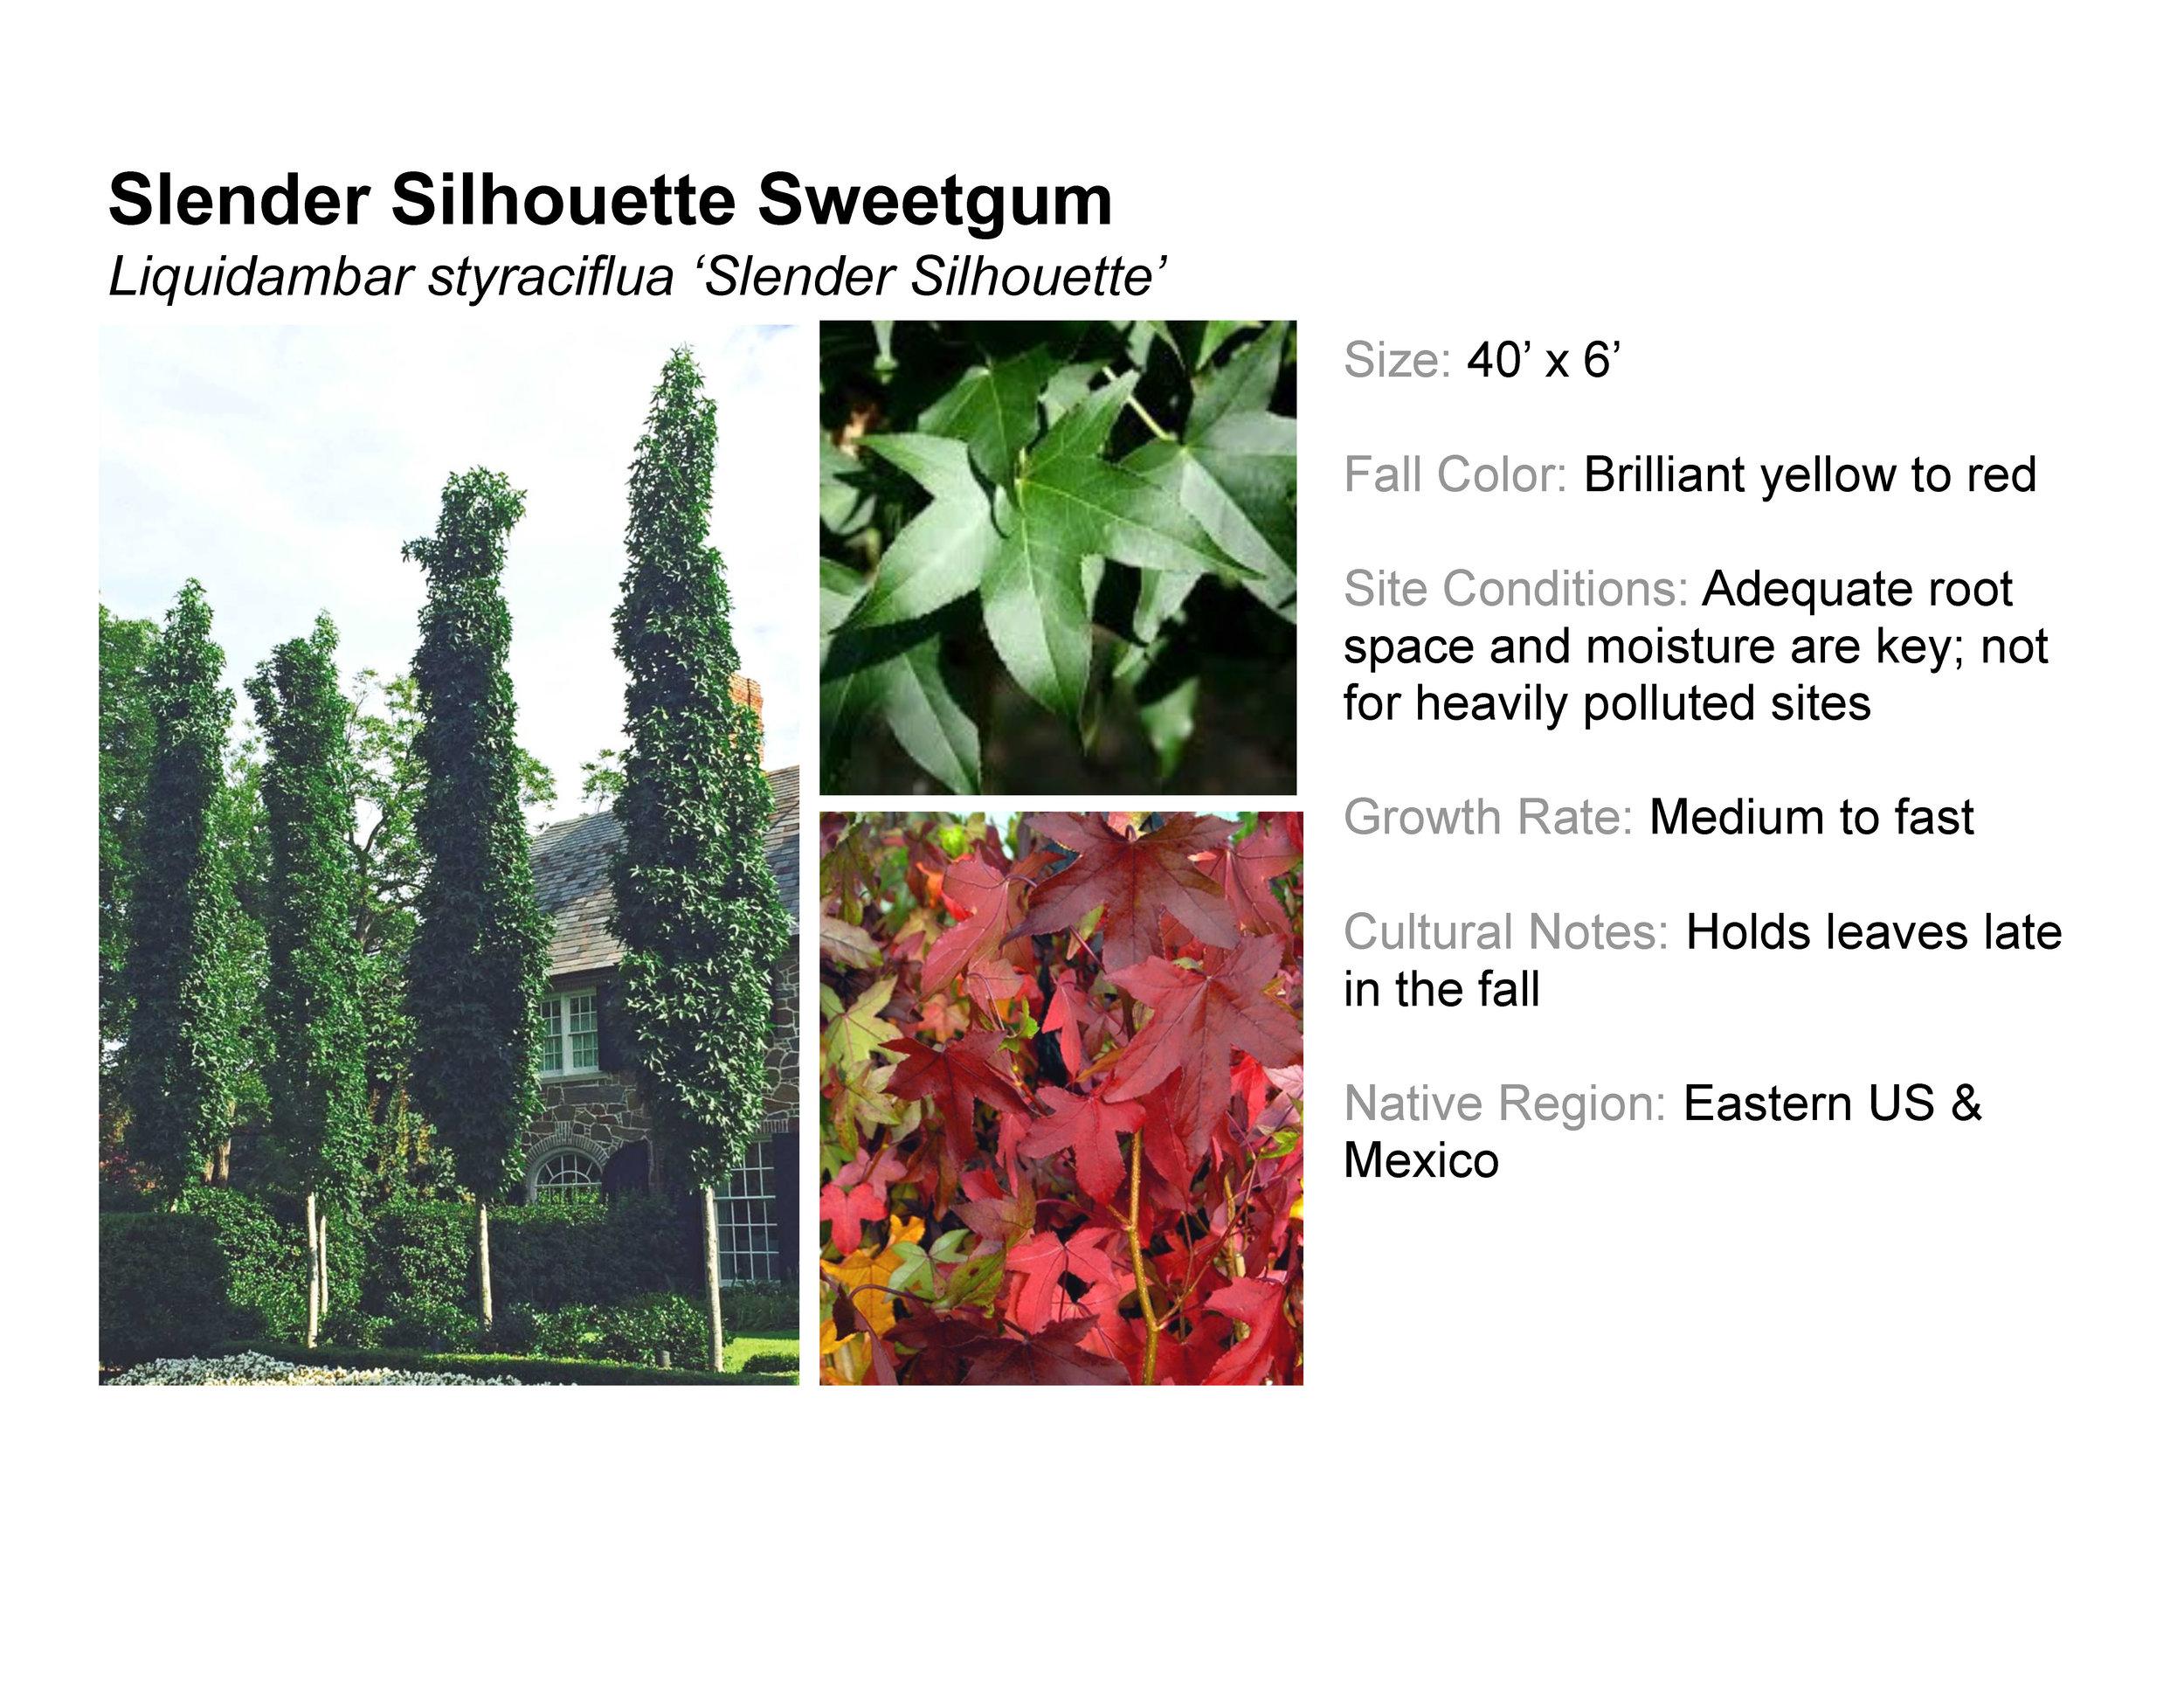 Slender Silhouette Sweetgum